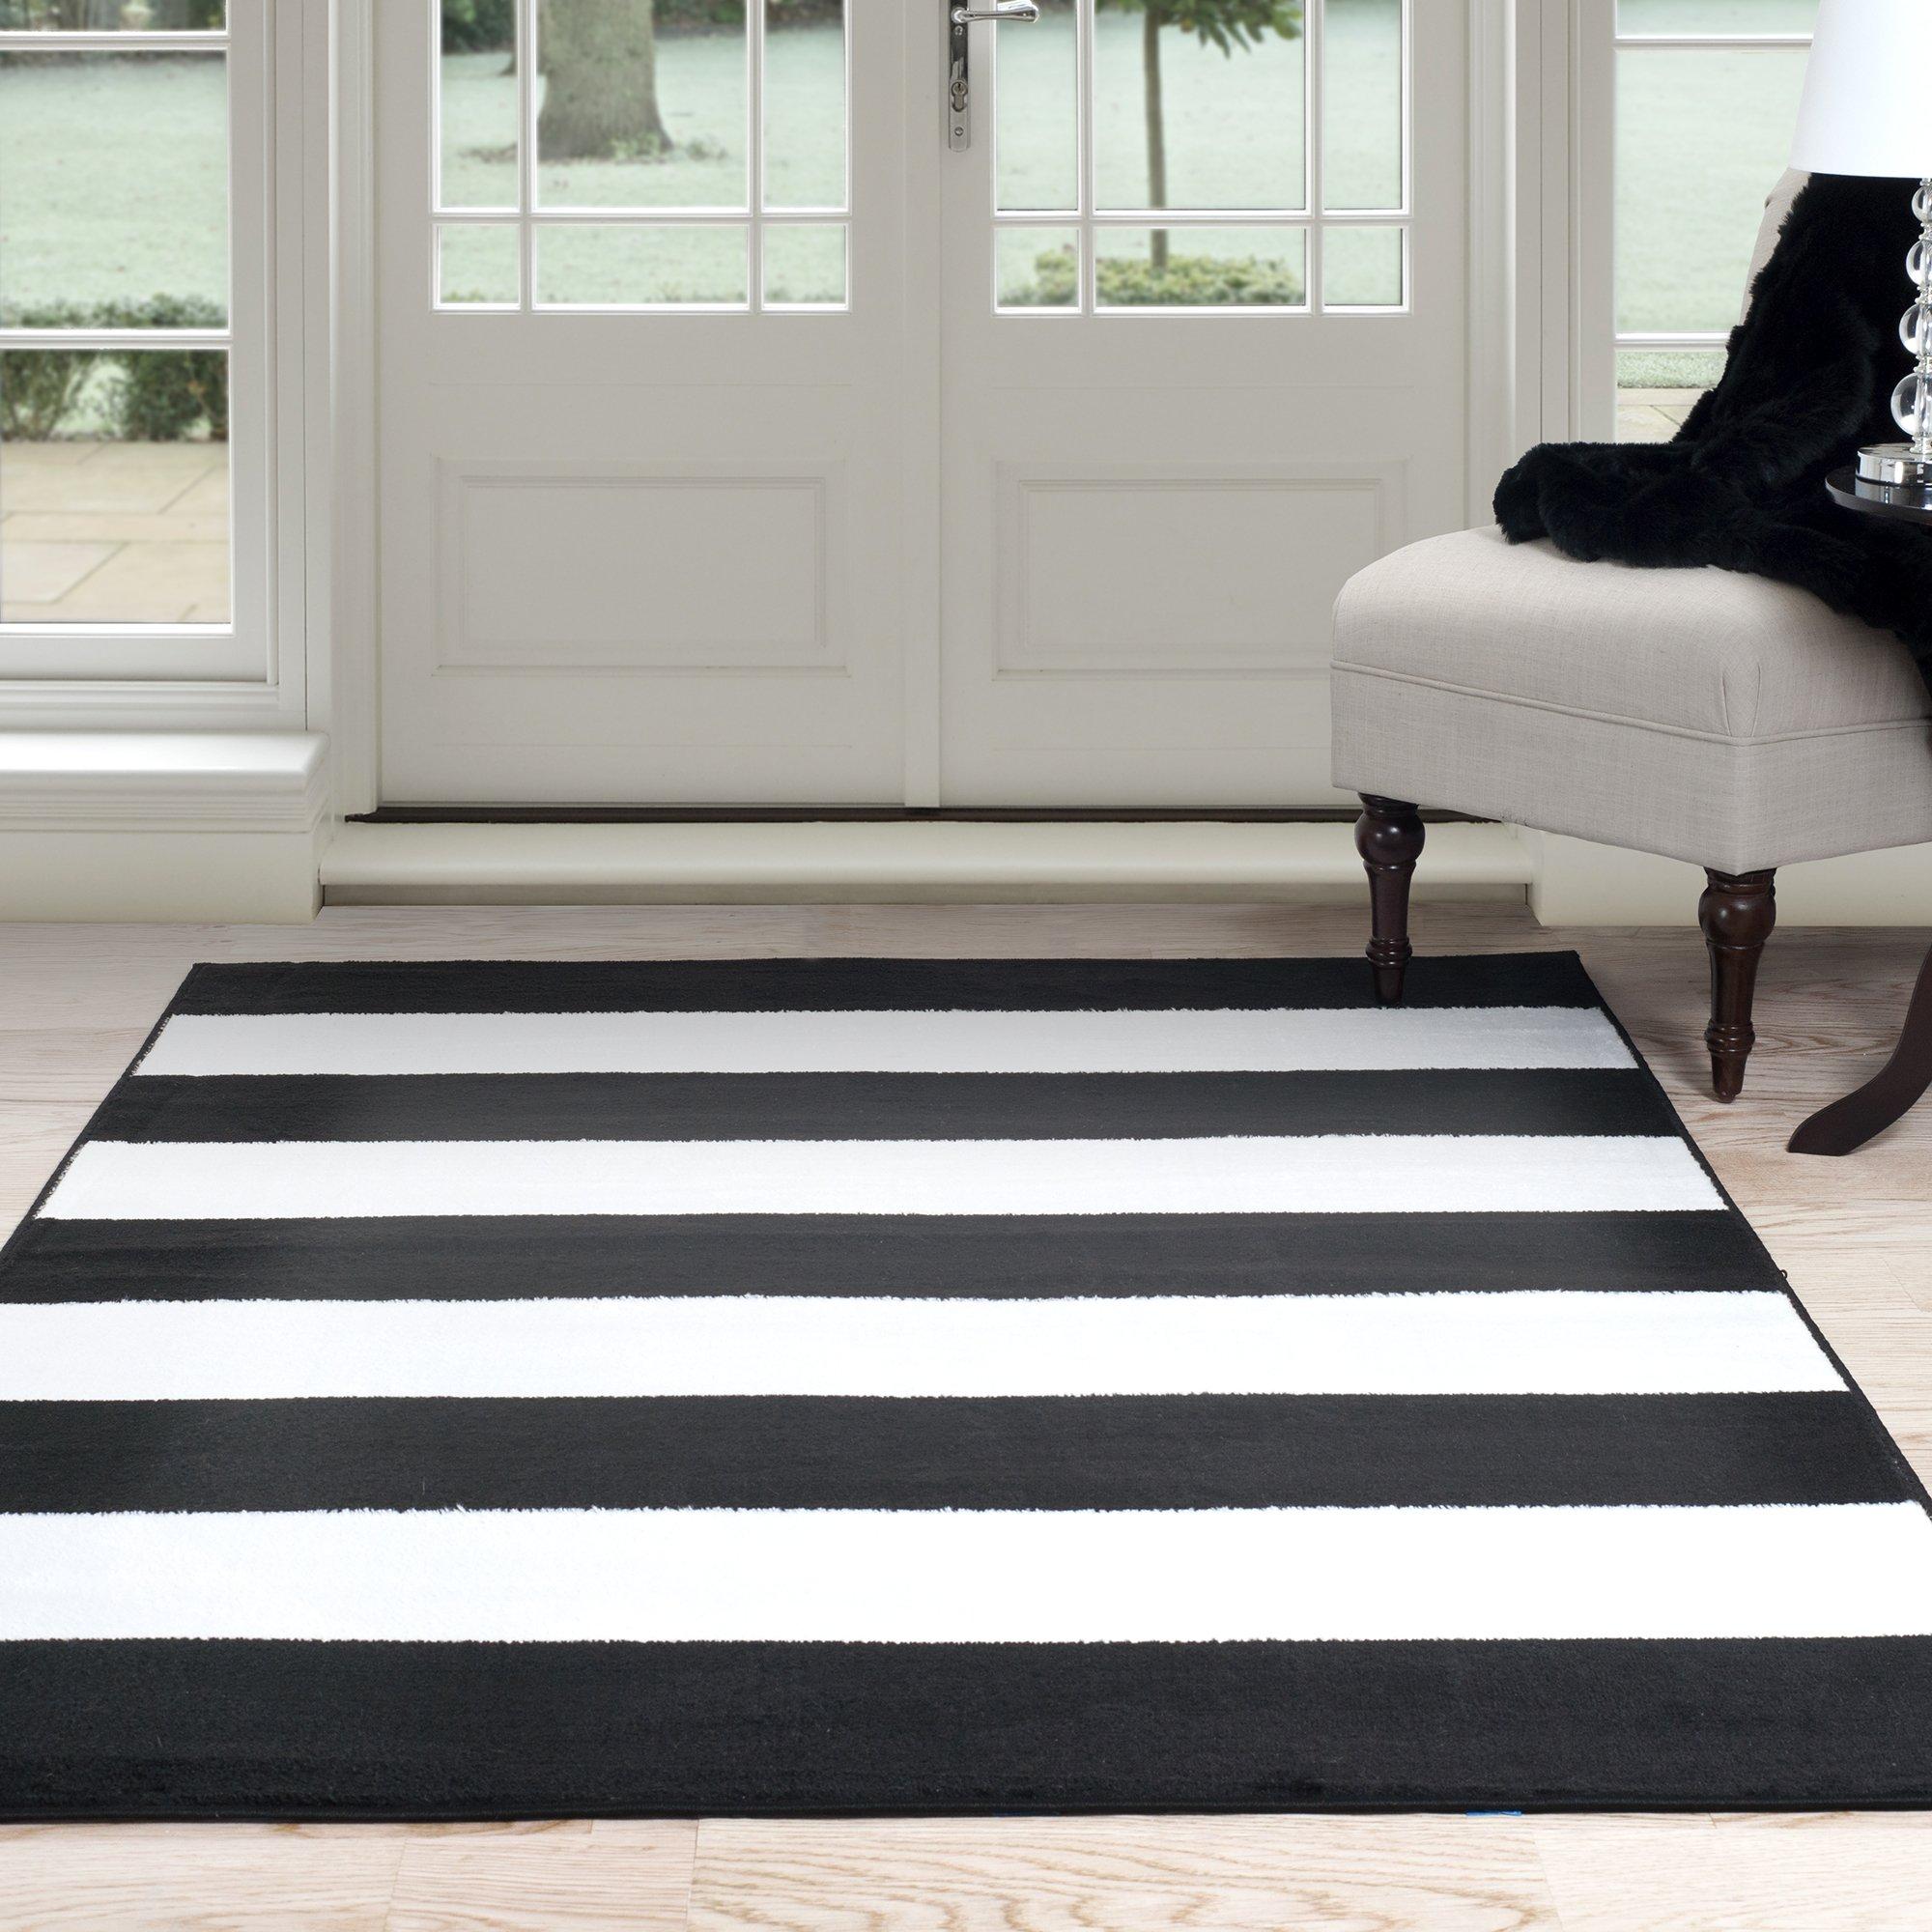 Lavish Home Breton Stripe Area Rug, 4' by 6', Black/White